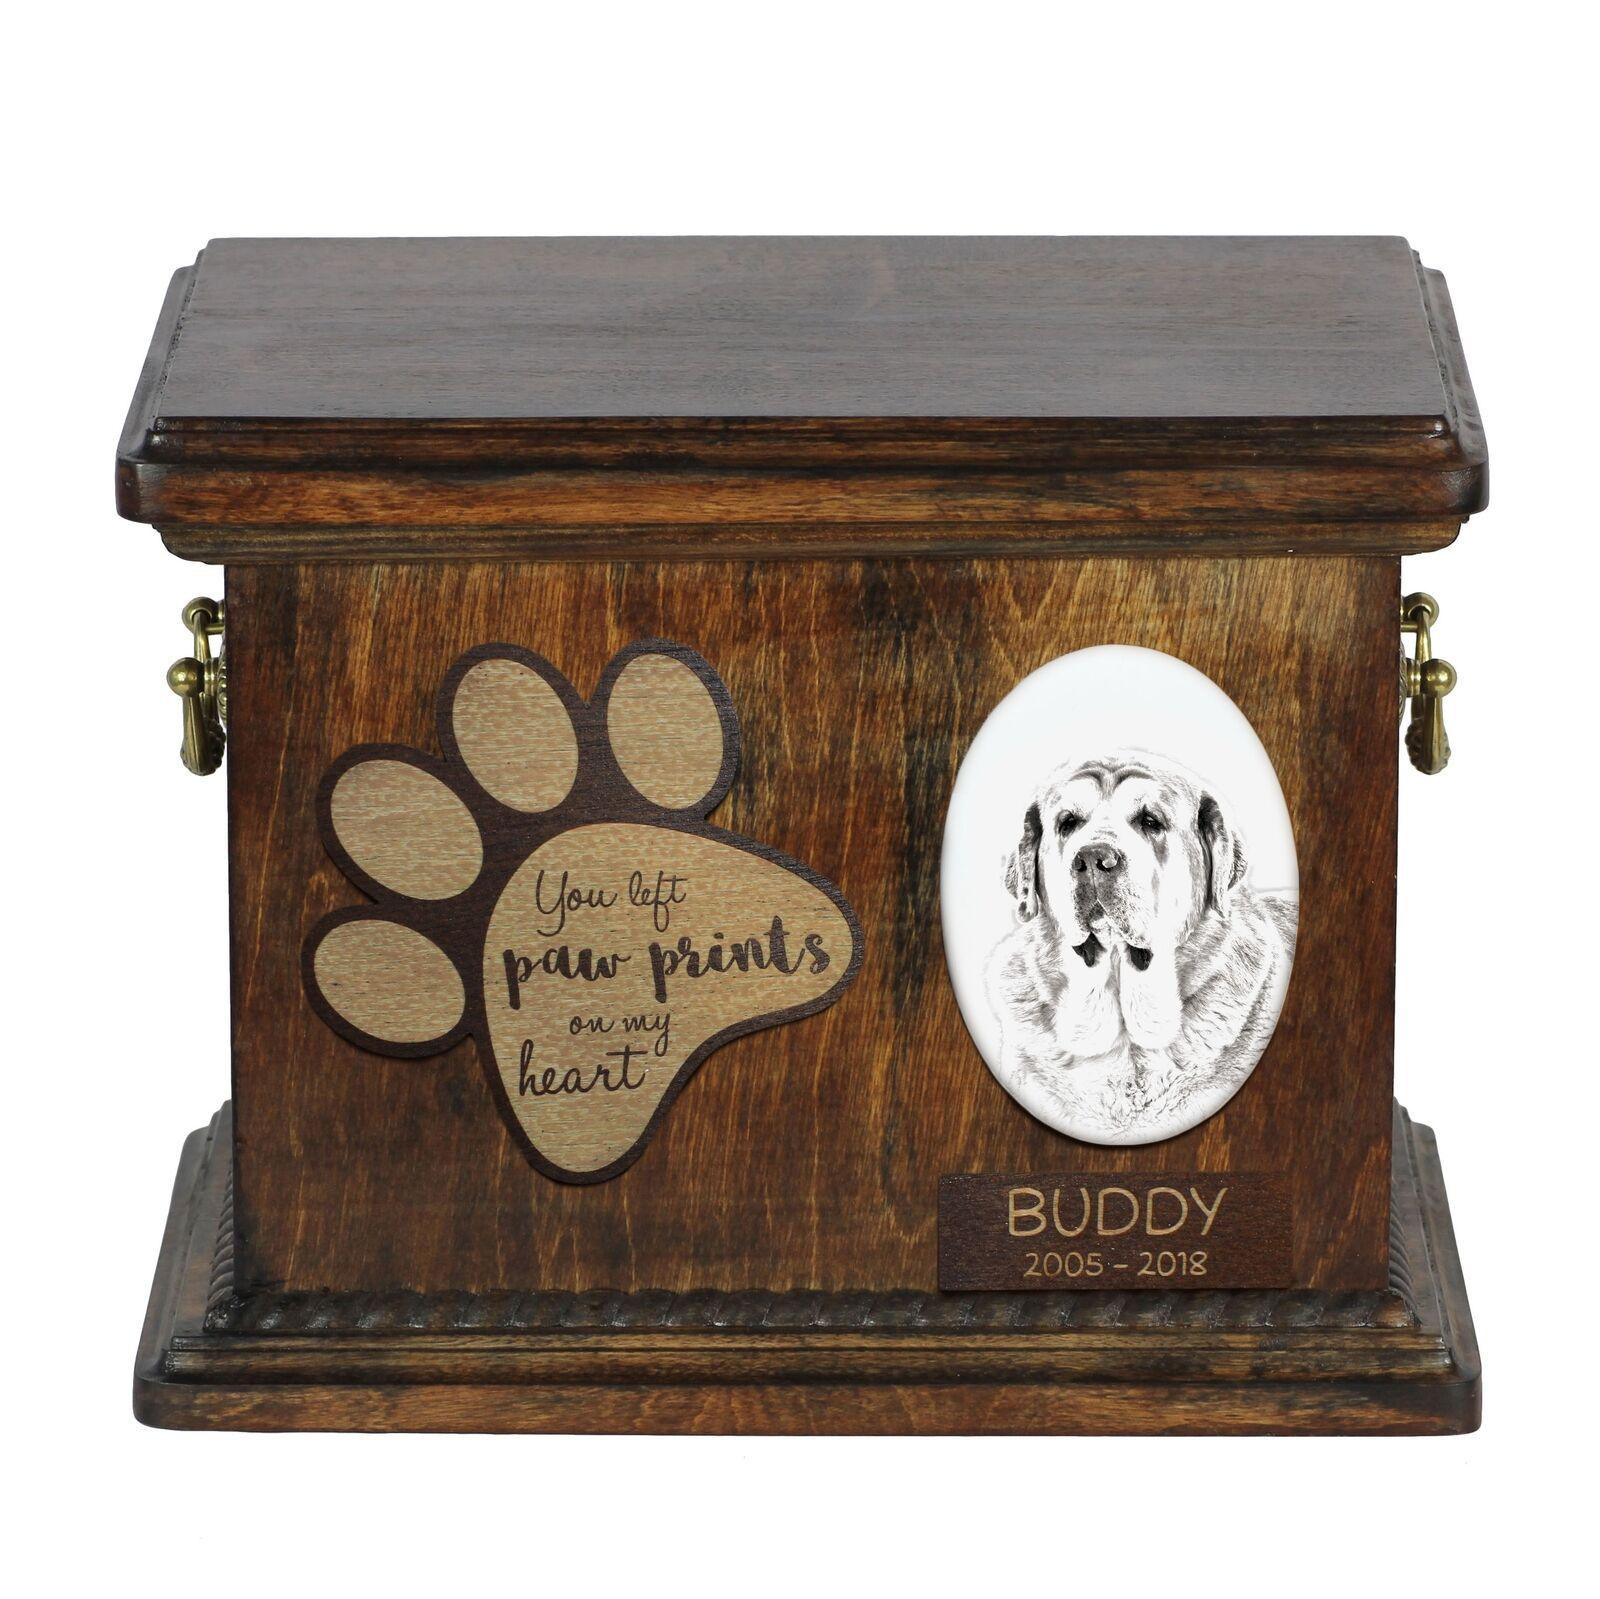 Spanish Mastiff - Urn for dog's ashes with ceramic ceramic ceramic plate and description ArtDog 83a2eb